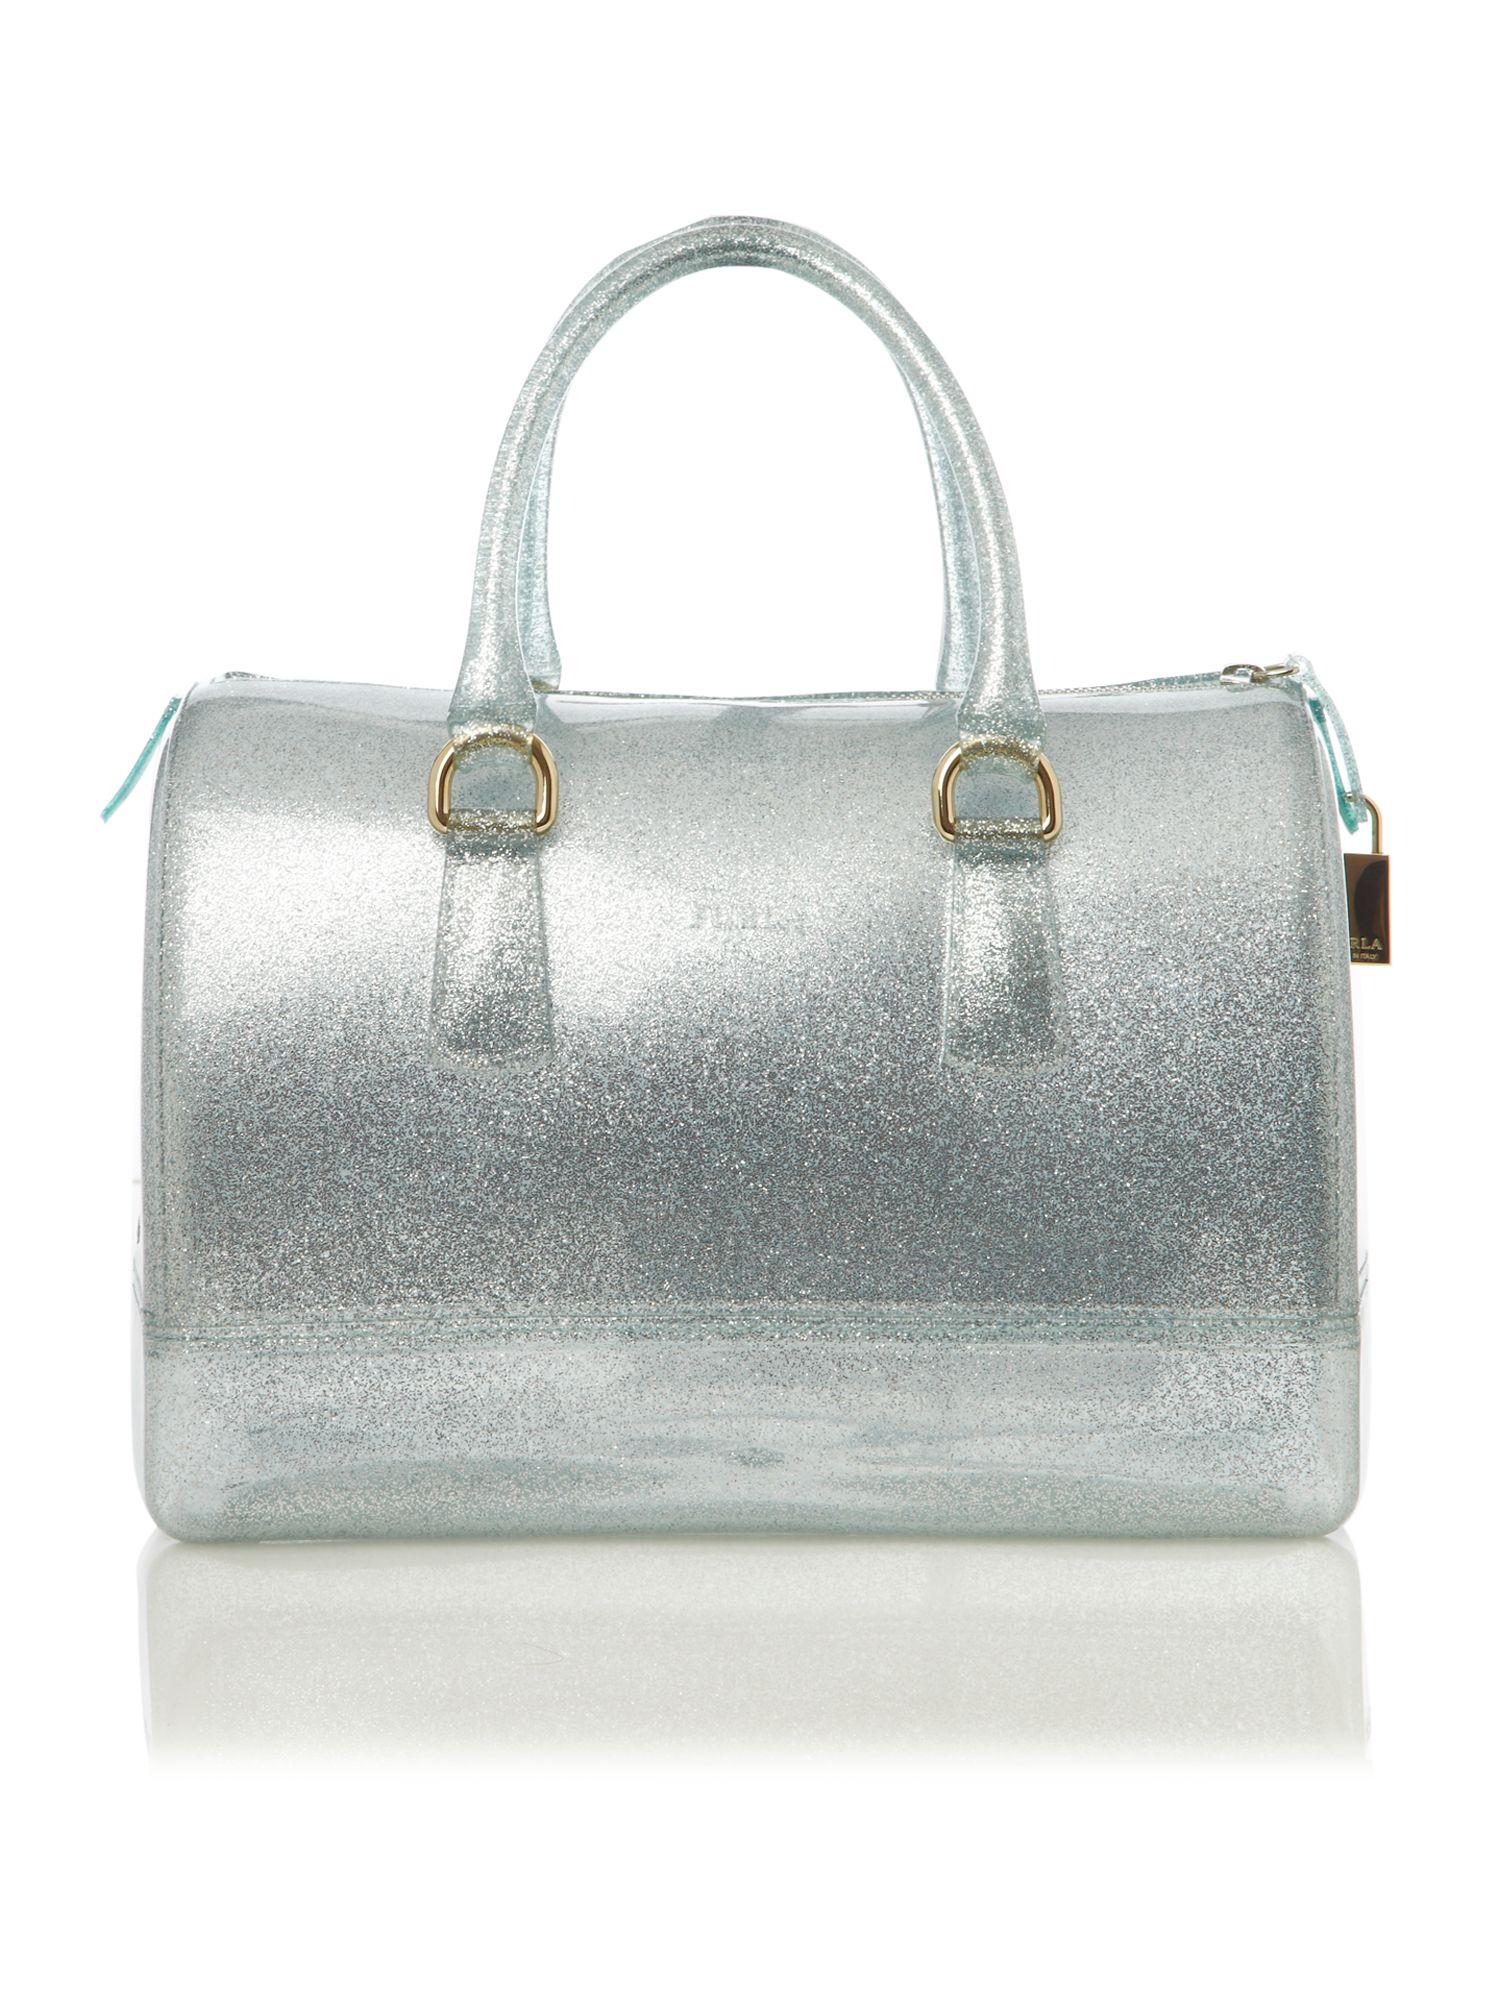 Furla Candy Glitter Bowling Bag in Metallic - Lyst 9a1013320610